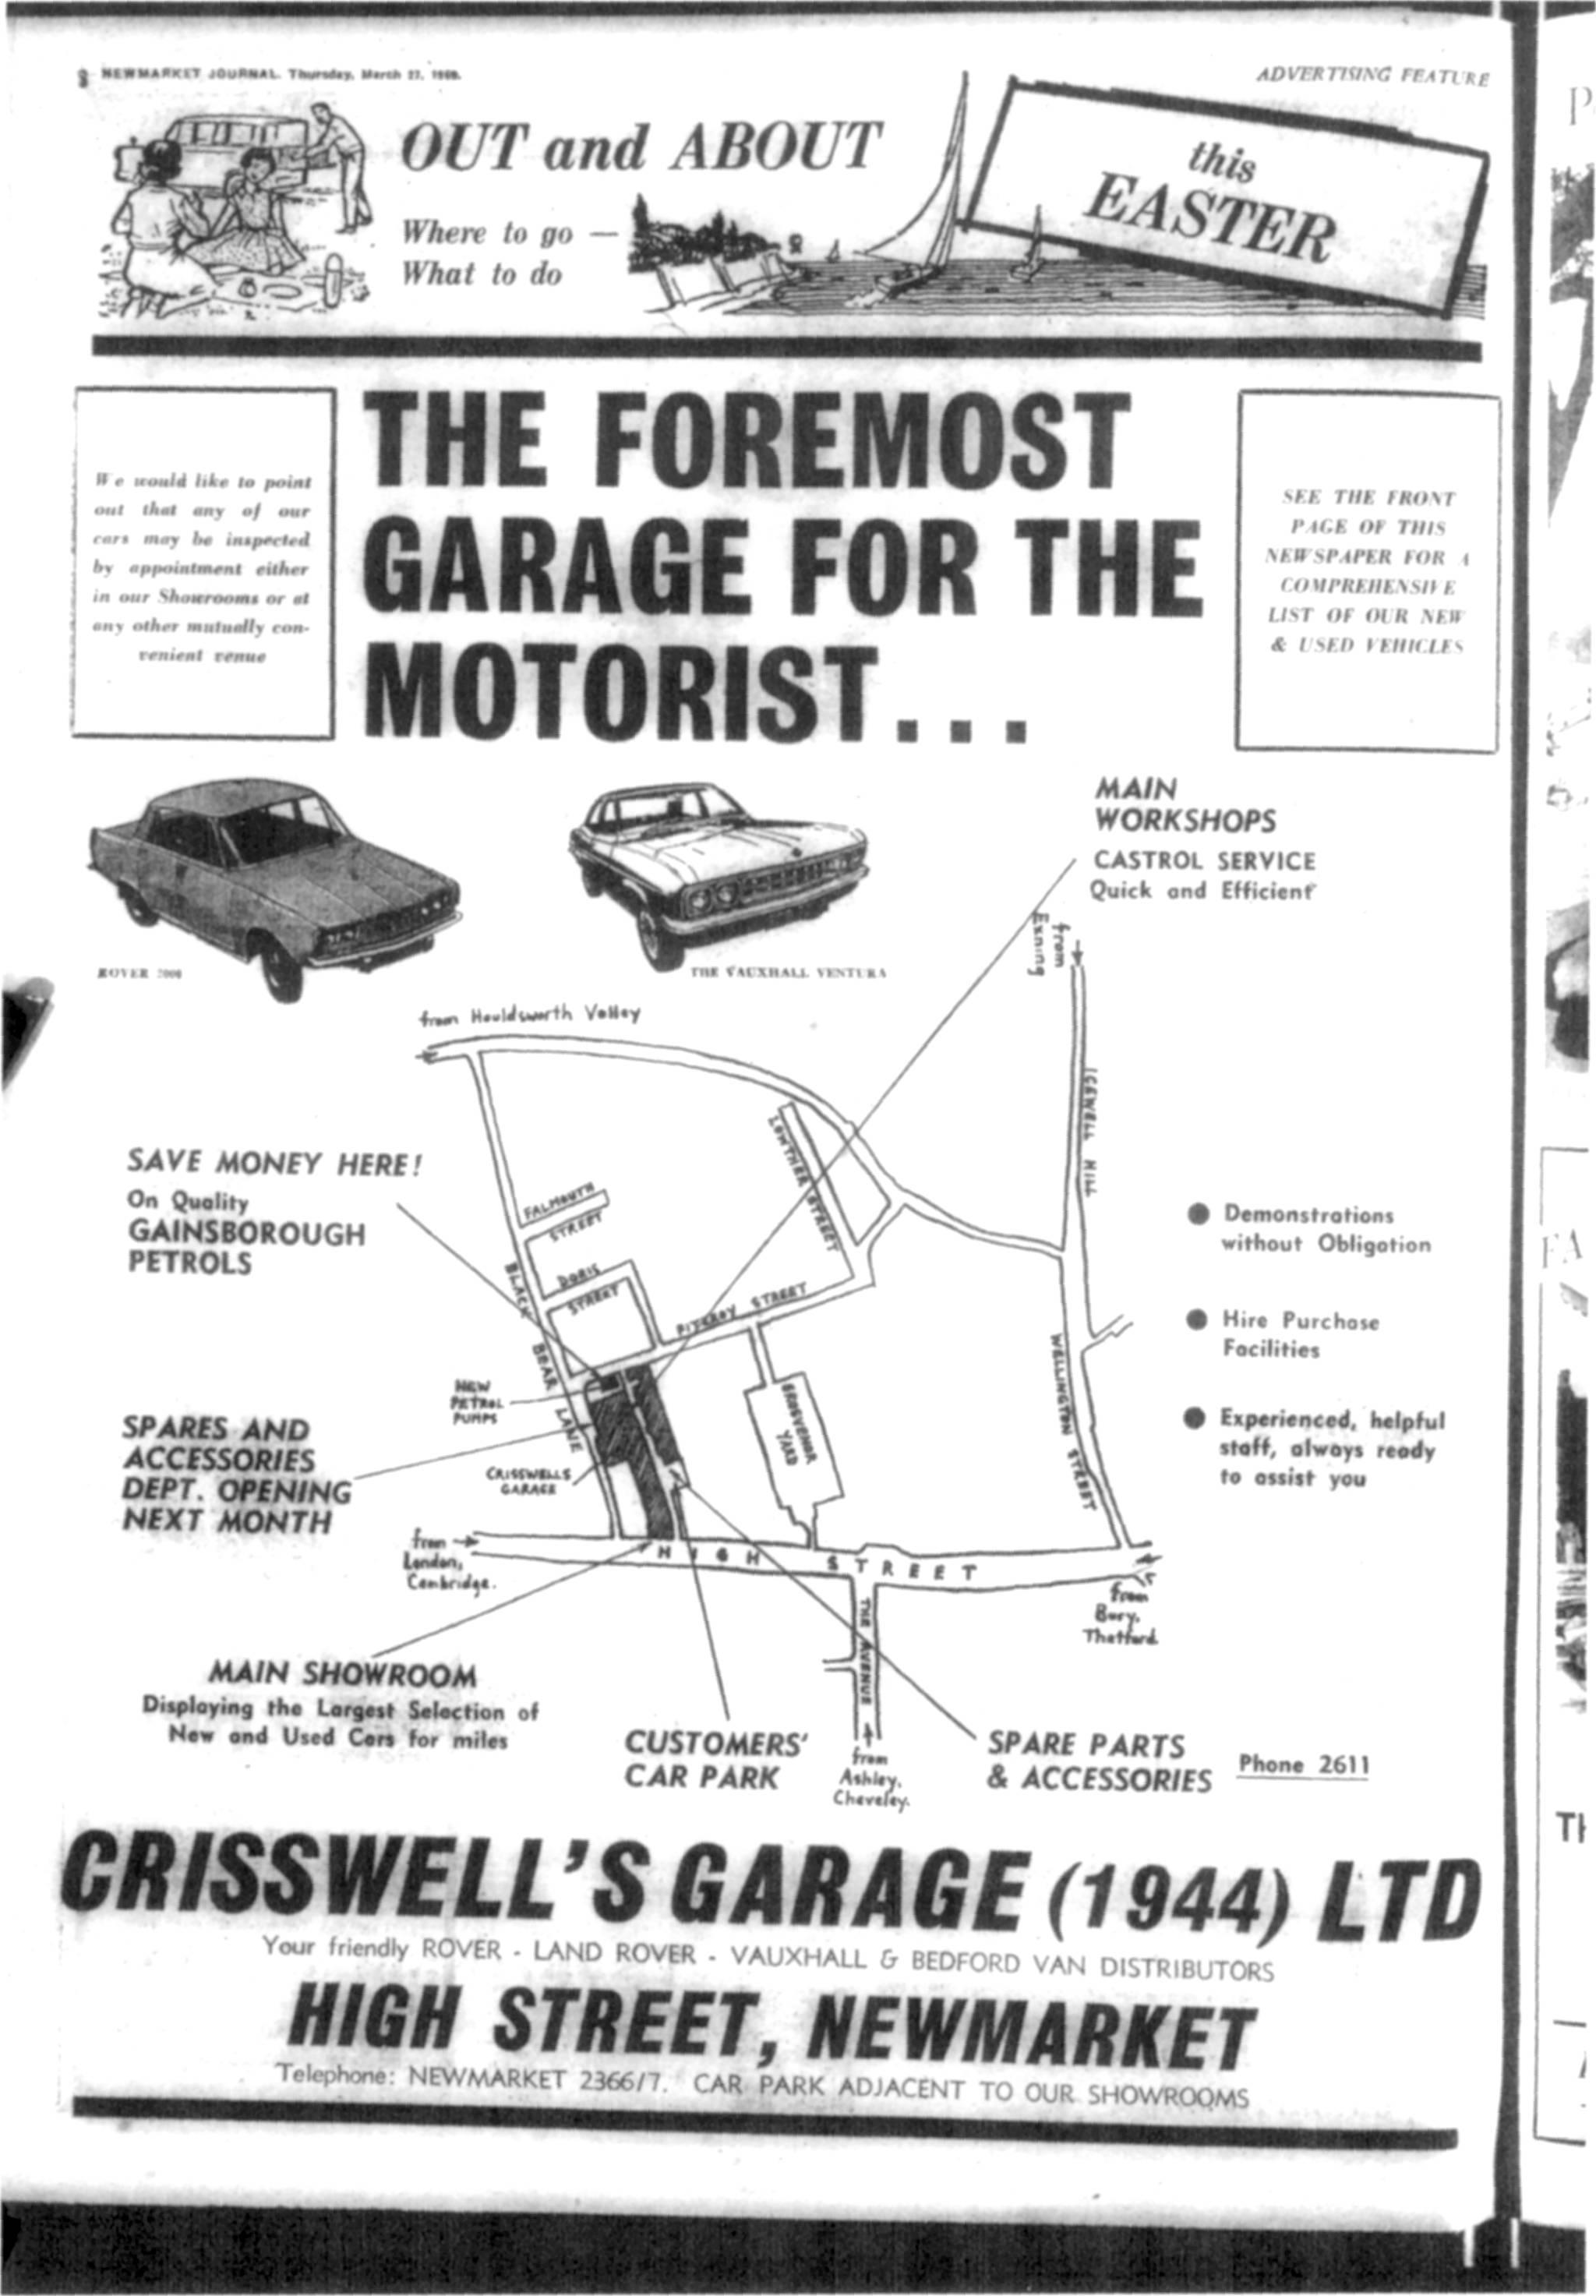 Crisswells Garage Advert Th March